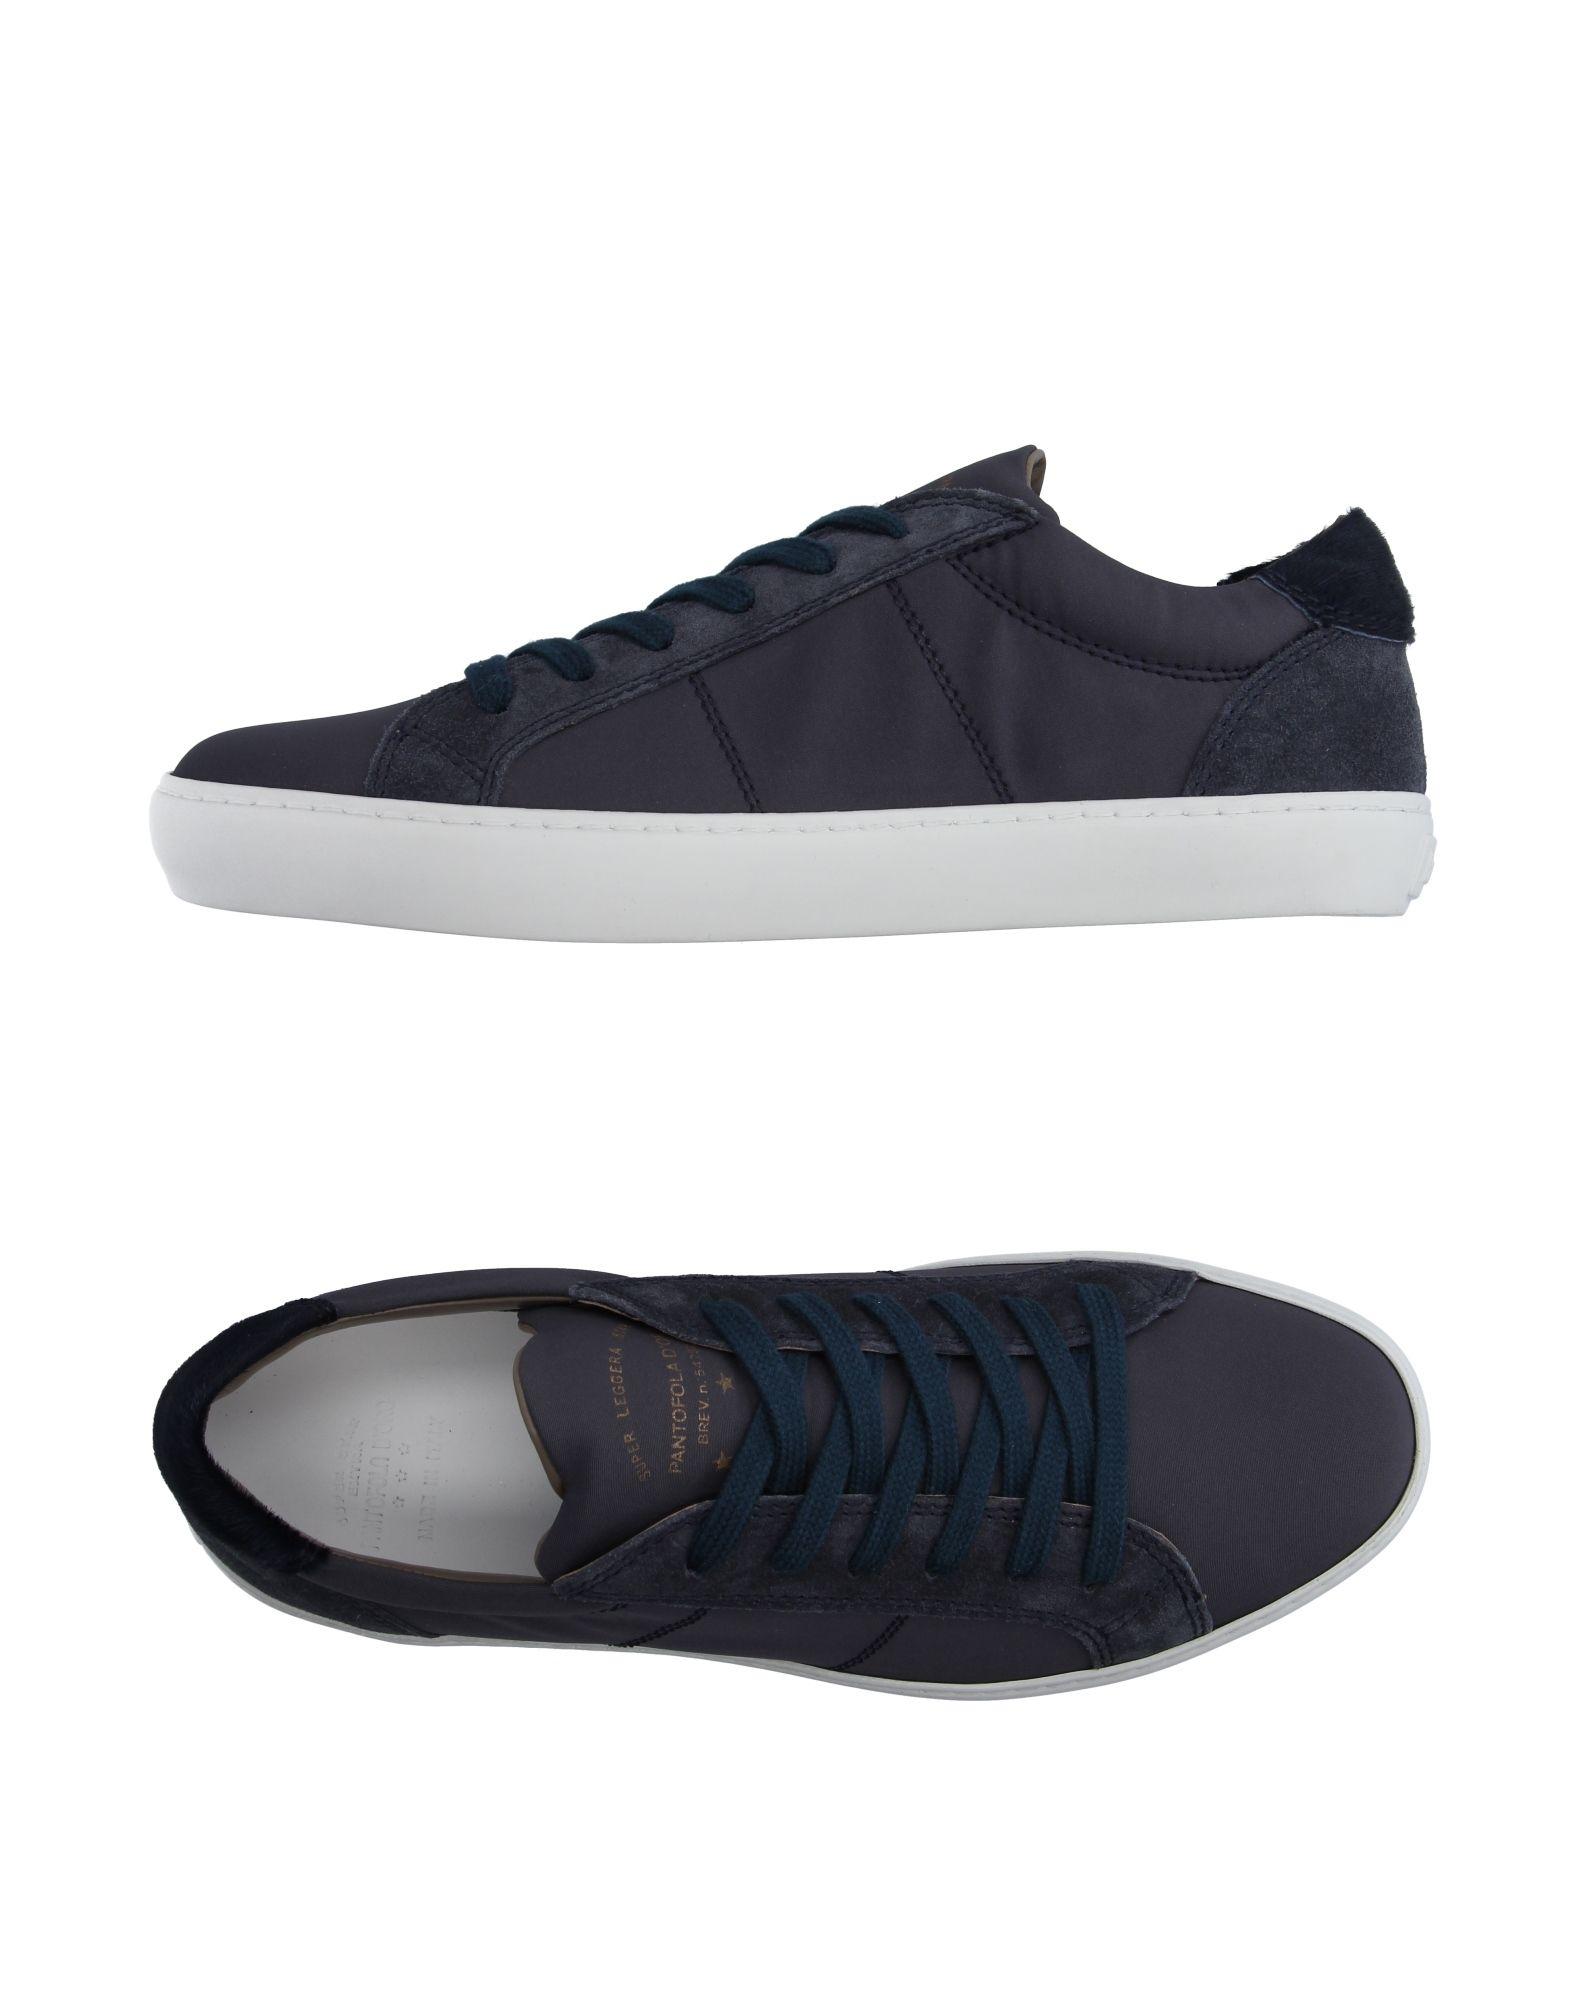 Pantofola D'oro Sneakers Damen  11107742HM Gute Qualität beliebte Schuhe